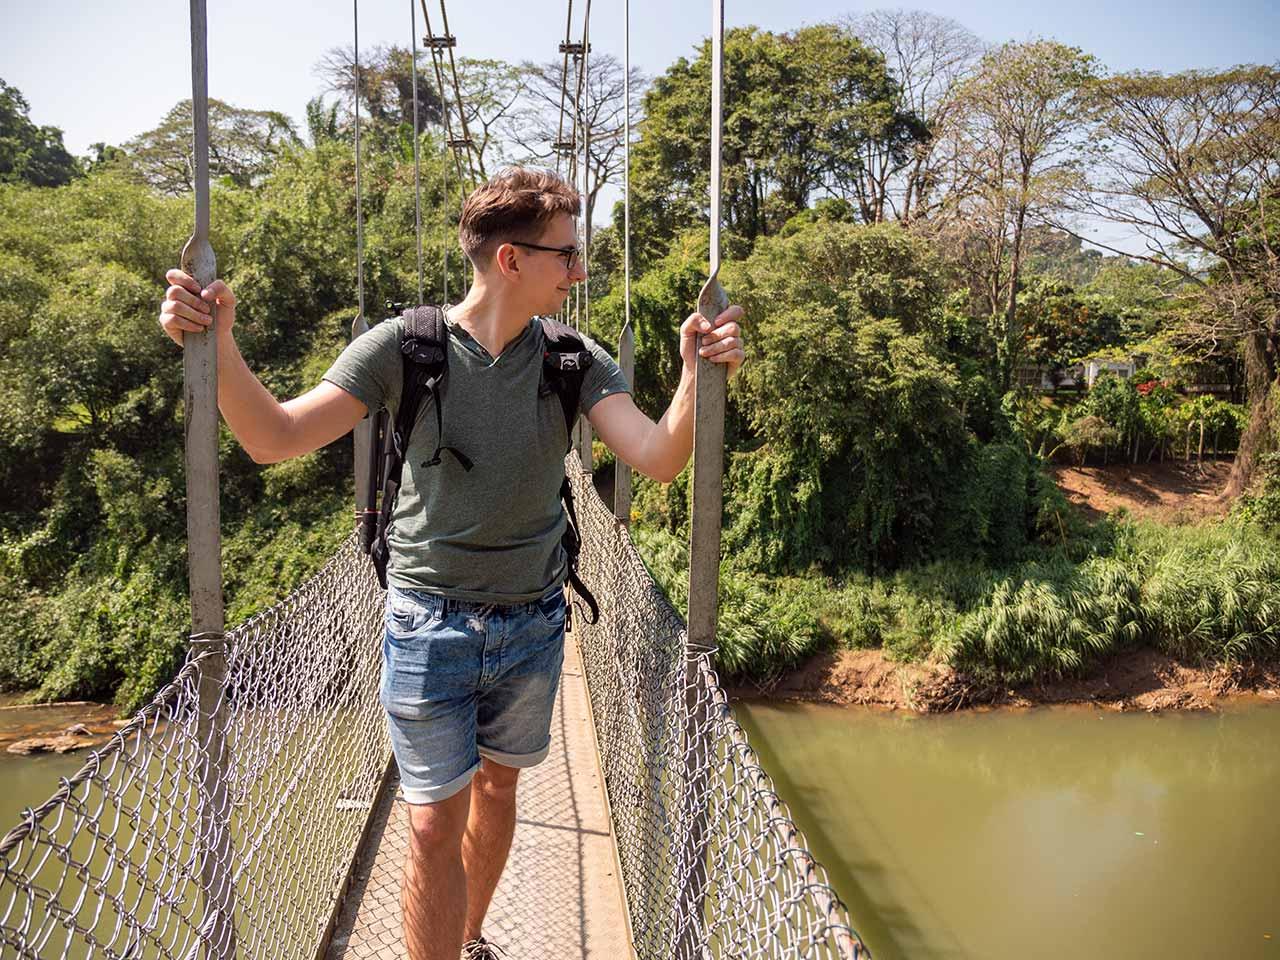 Valentin auf der Brücke vom Royal Botanical Garden in Kandy, Sri Lanka